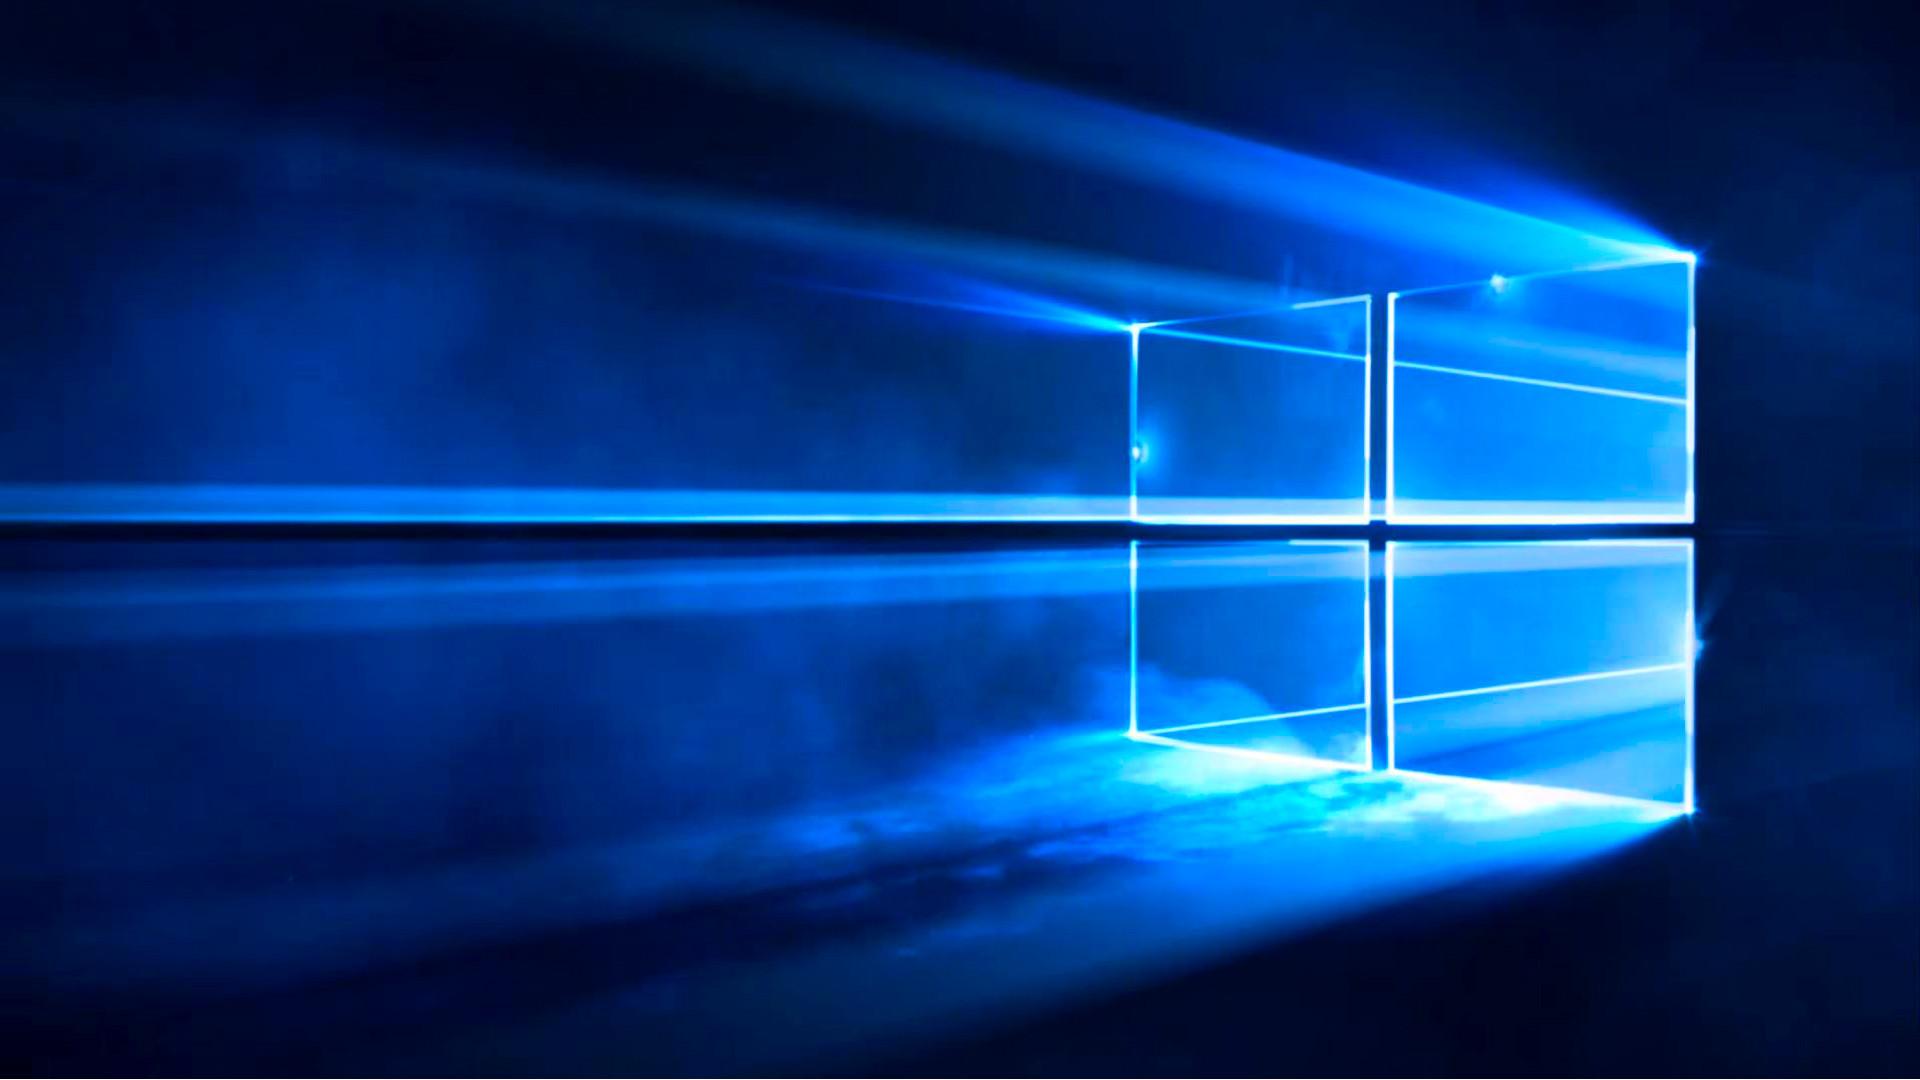 Purple Windows 10 Wallpaper 83 Images